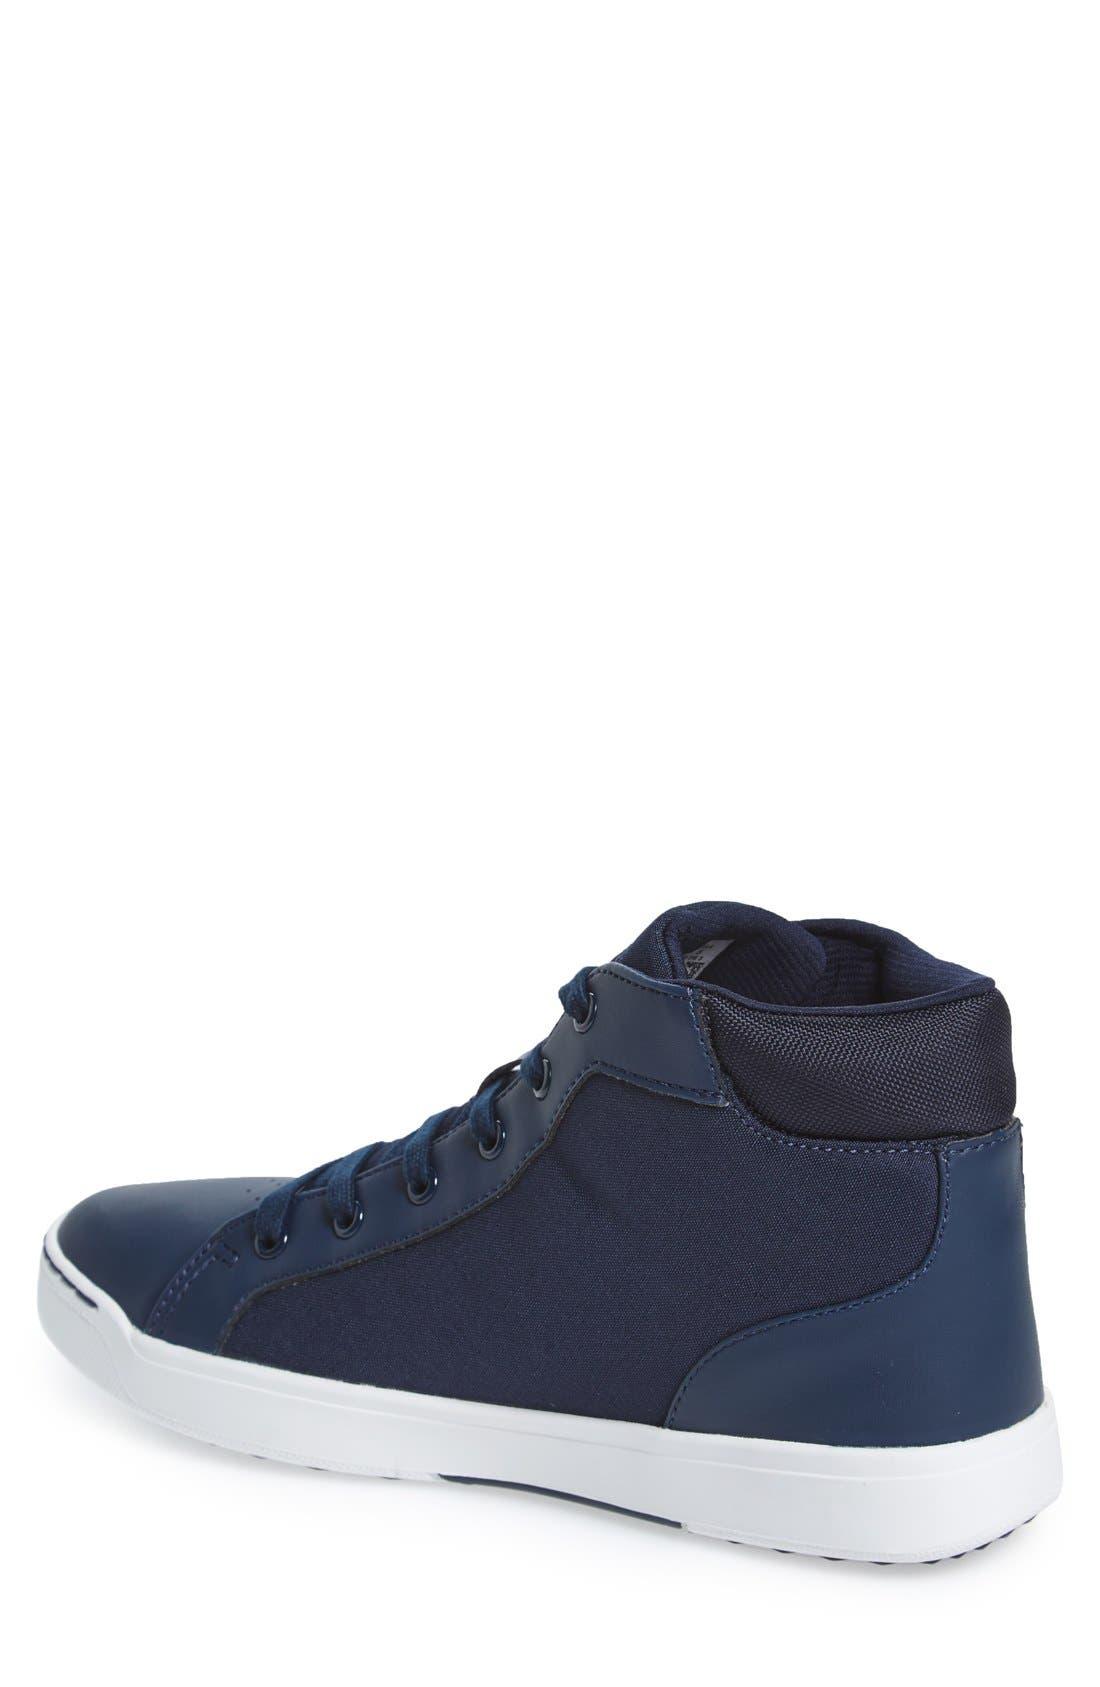 'Explorateur' Midi Sneaker,                             Alternate thumbnail 2, color,                             410